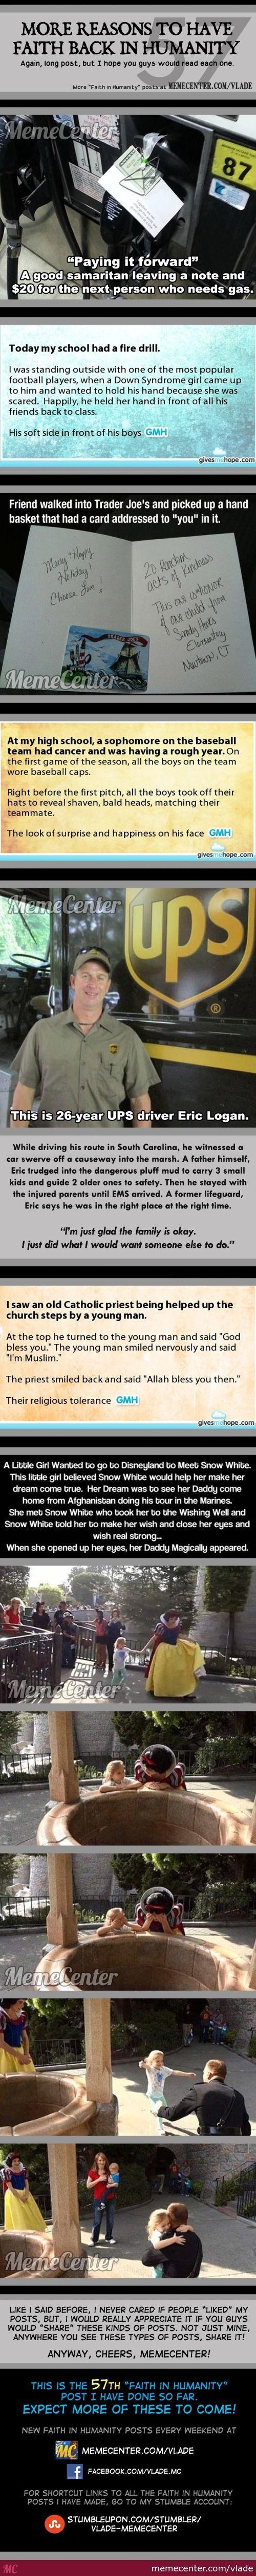 OMG! Faith on humanity restored